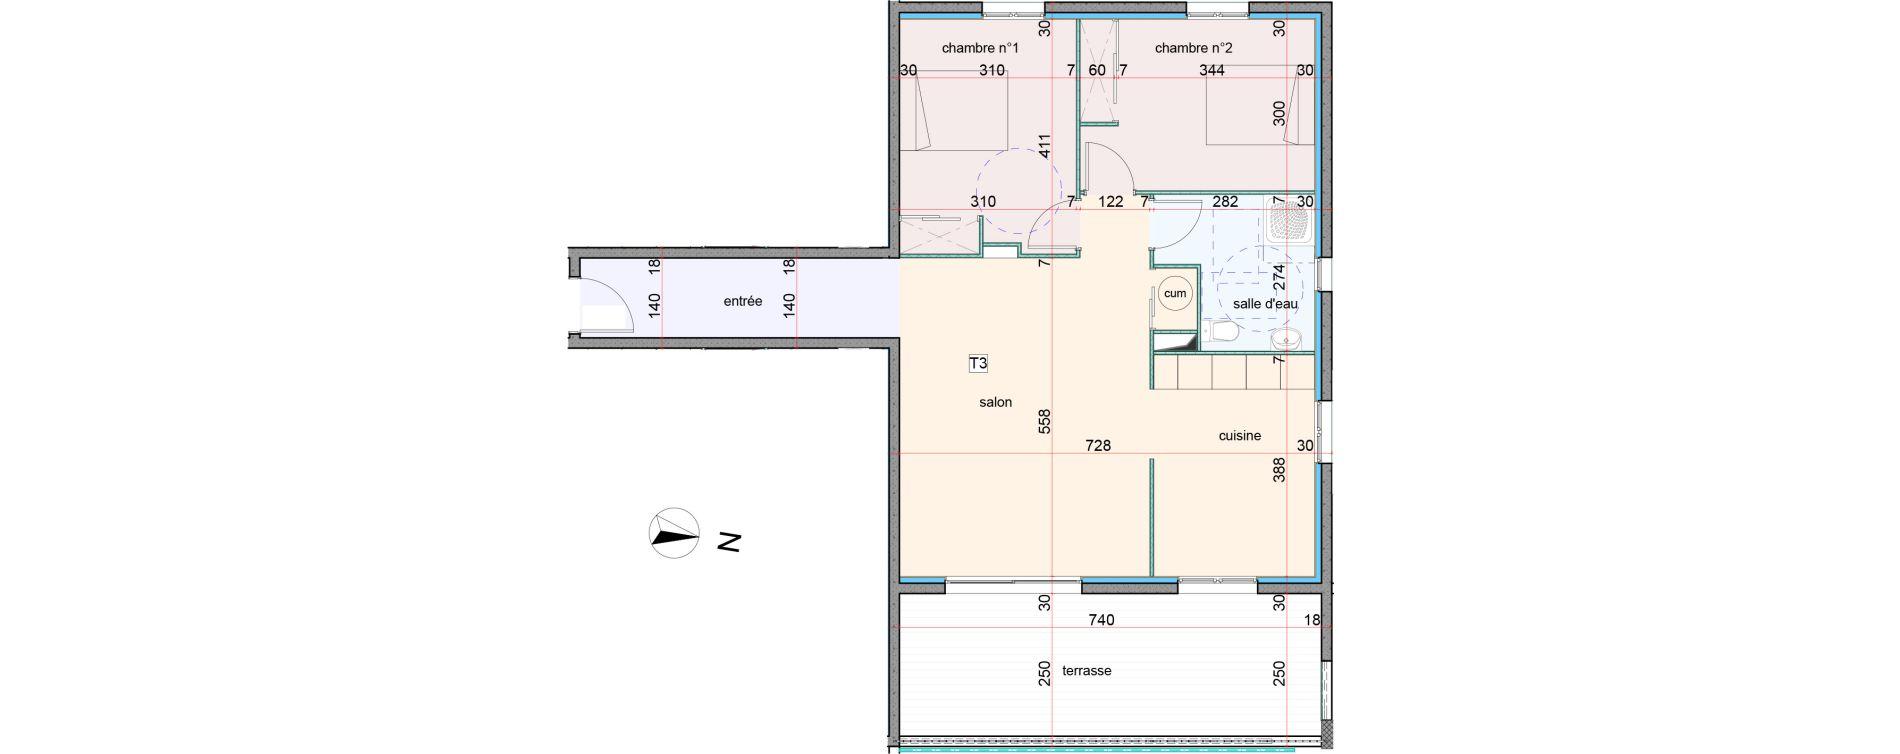 Appartement T3 de 77,20 m2 à Penta-Di-Casinca Centre